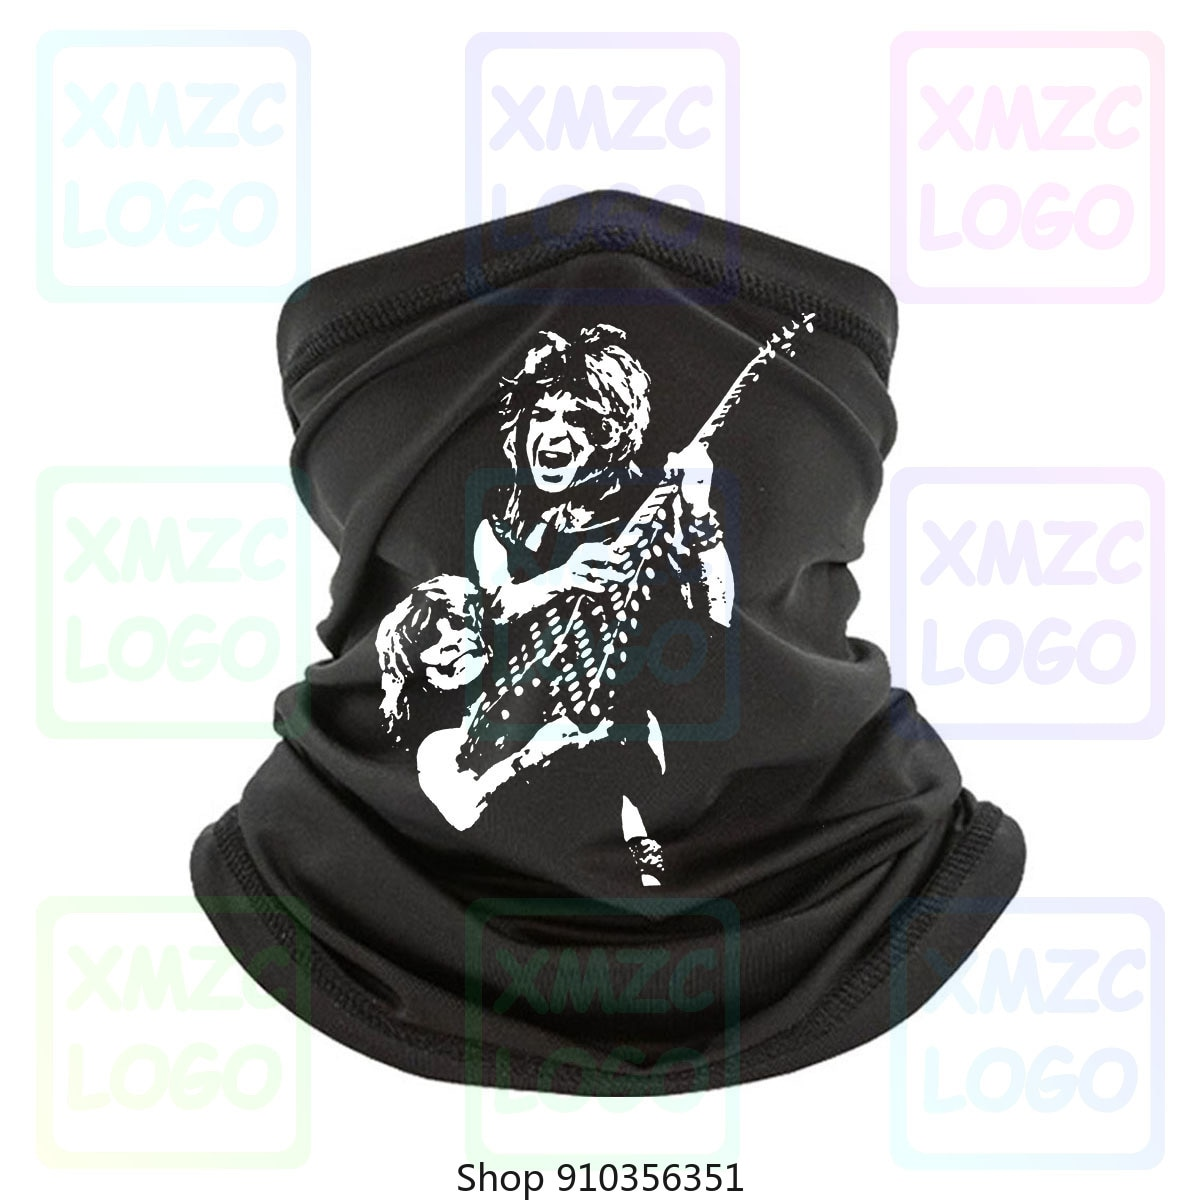 Ozzy Osbourne, Randy Rhoads, Bandana negra tributo 2012, para hombre, diadema, pañuelo, pañuelo, calentador de cuello, para mujer y hombre